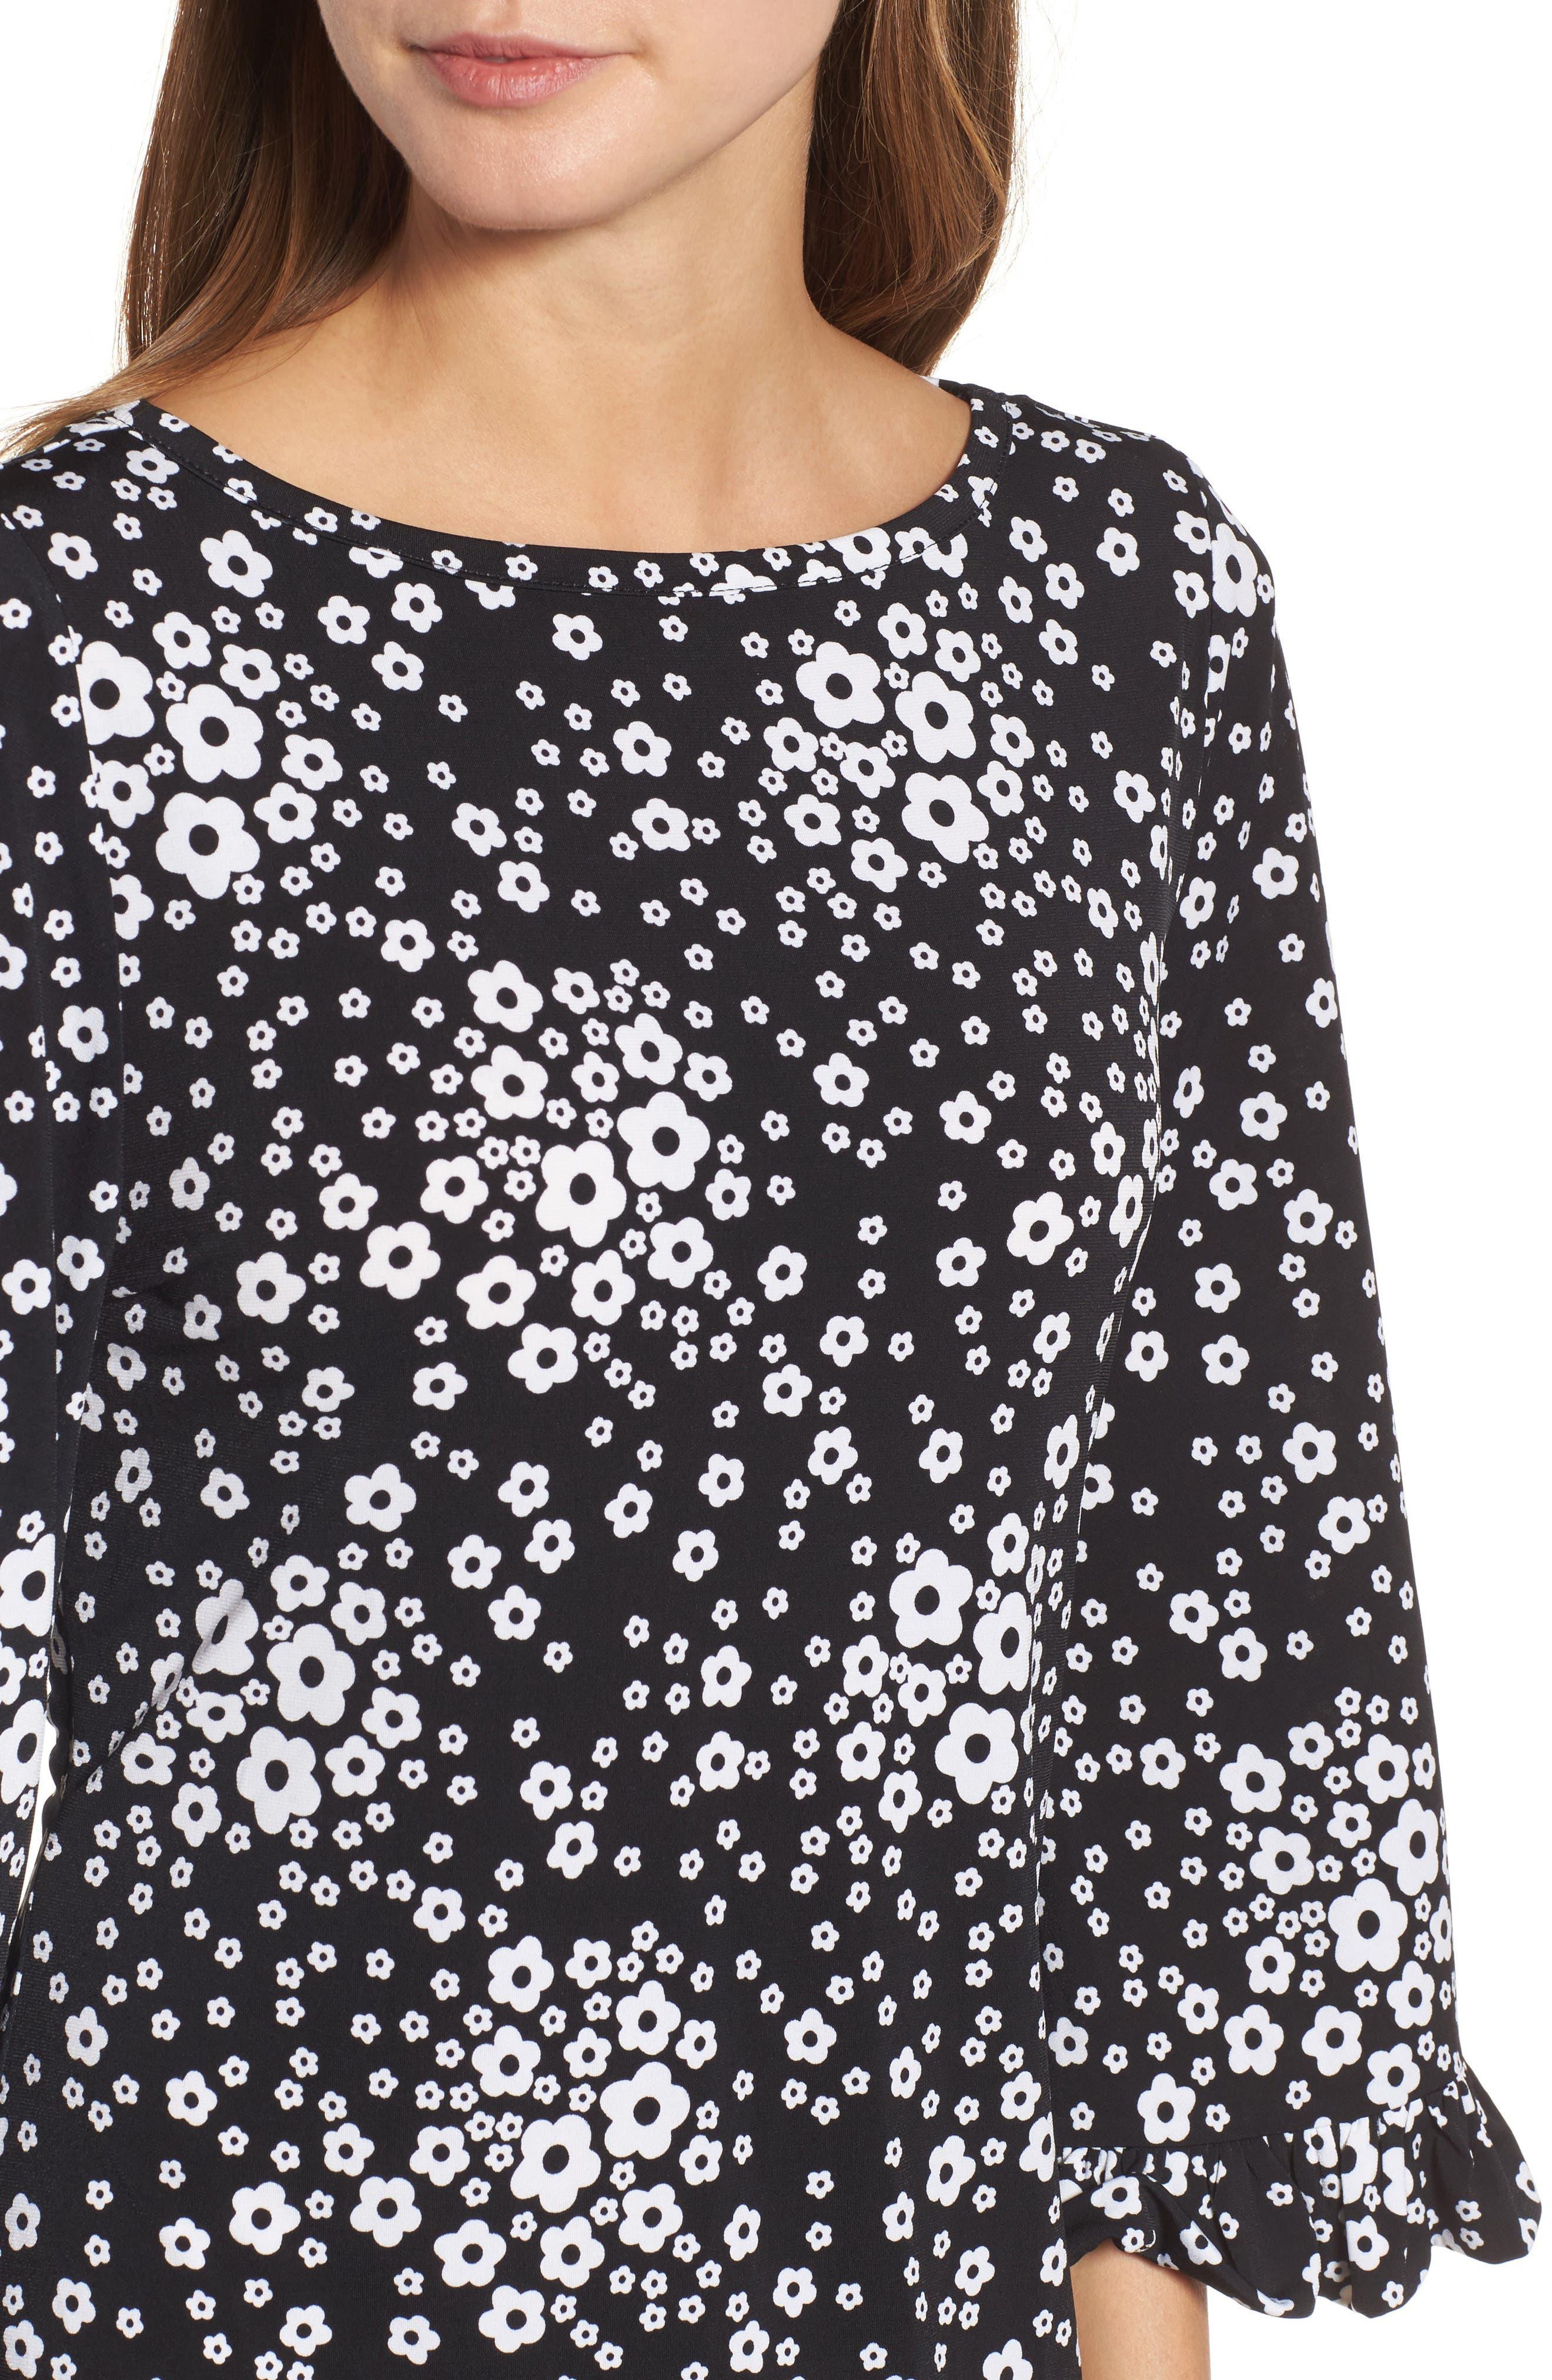 Floral Mod Shift Dress,                             Alternate thumbnail 4, color,                             Black/ White